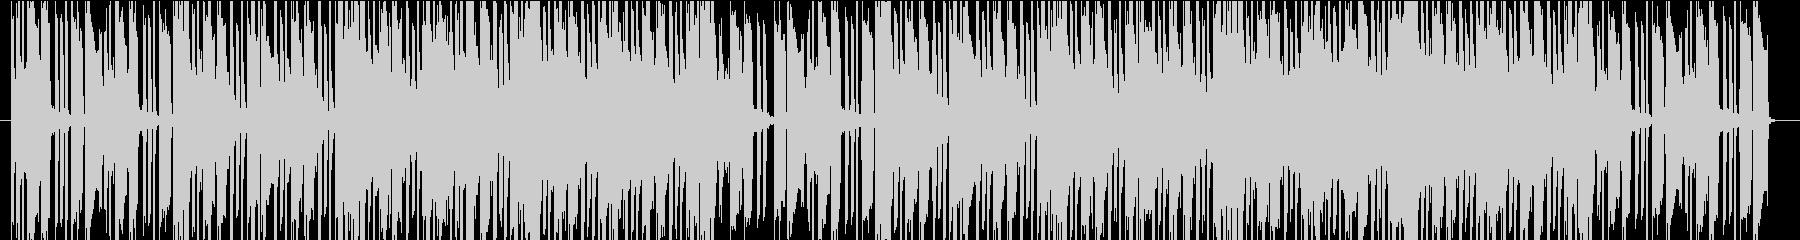 Drive Late Rock's unreproduced waveform